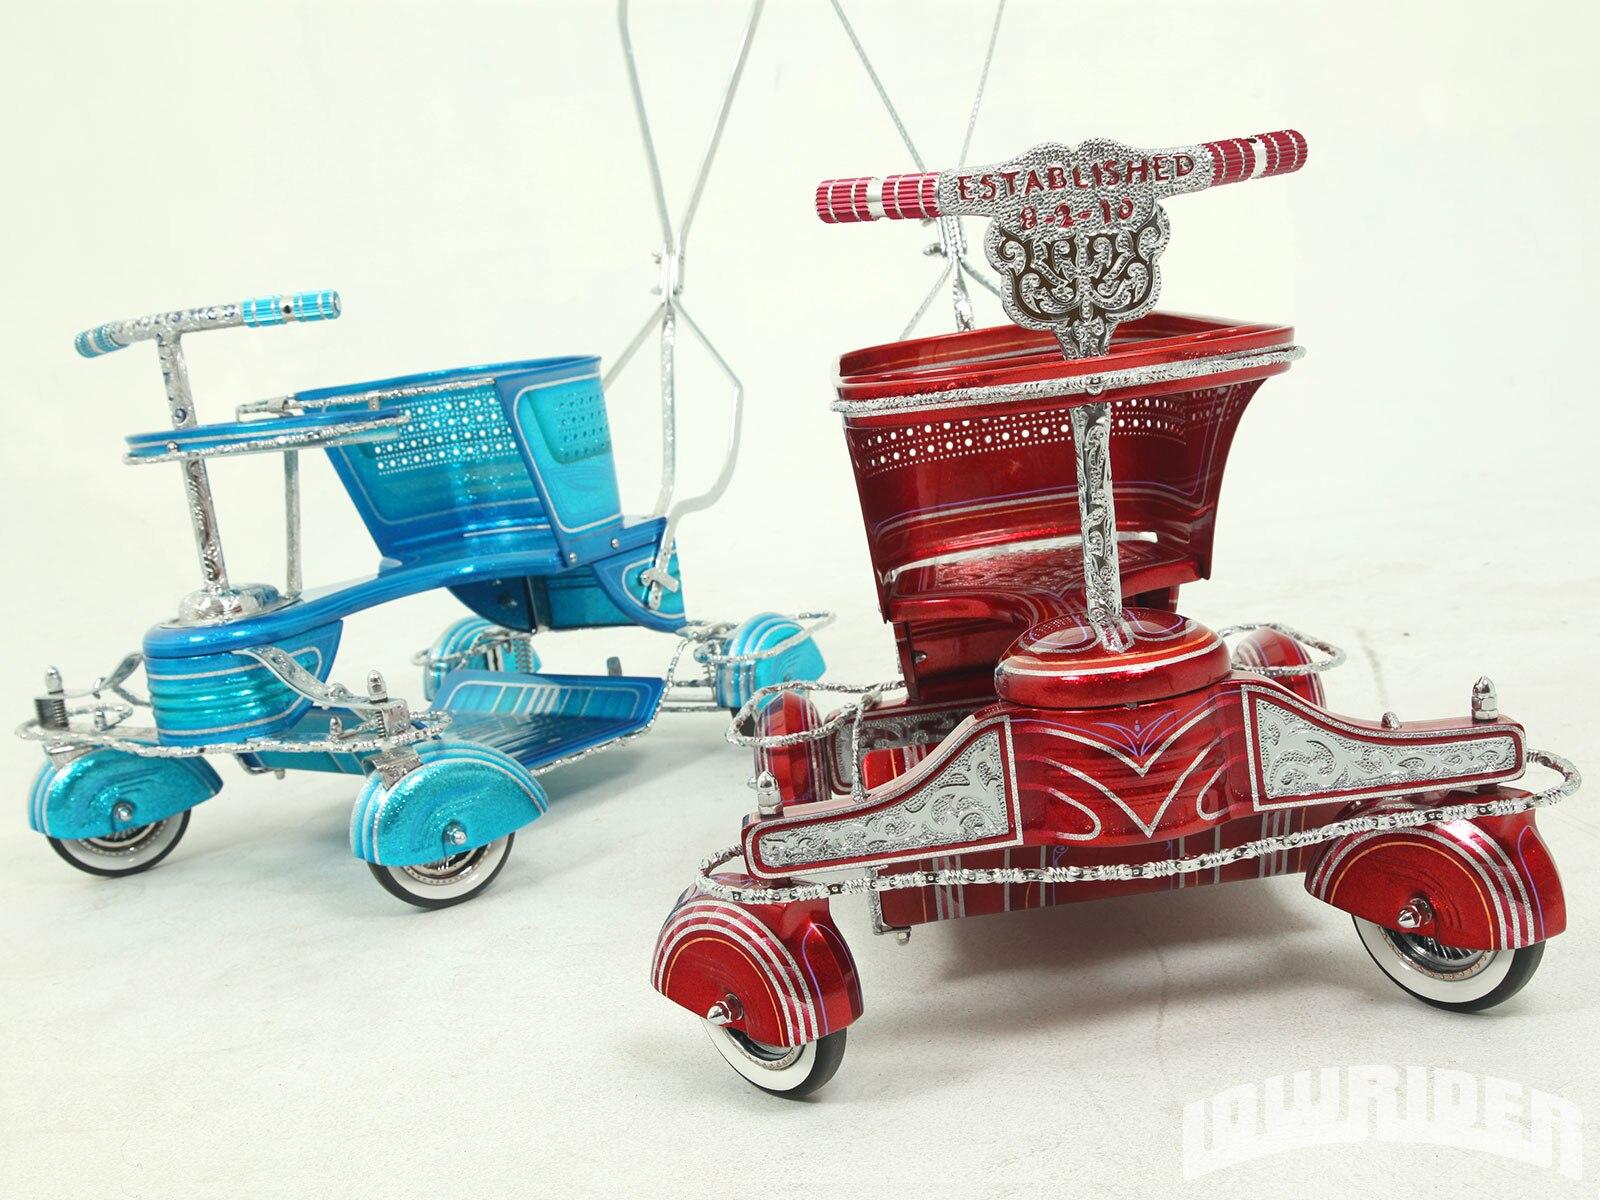 01-1949-1948-taylor-tot-stroller-custom-candy-paint2